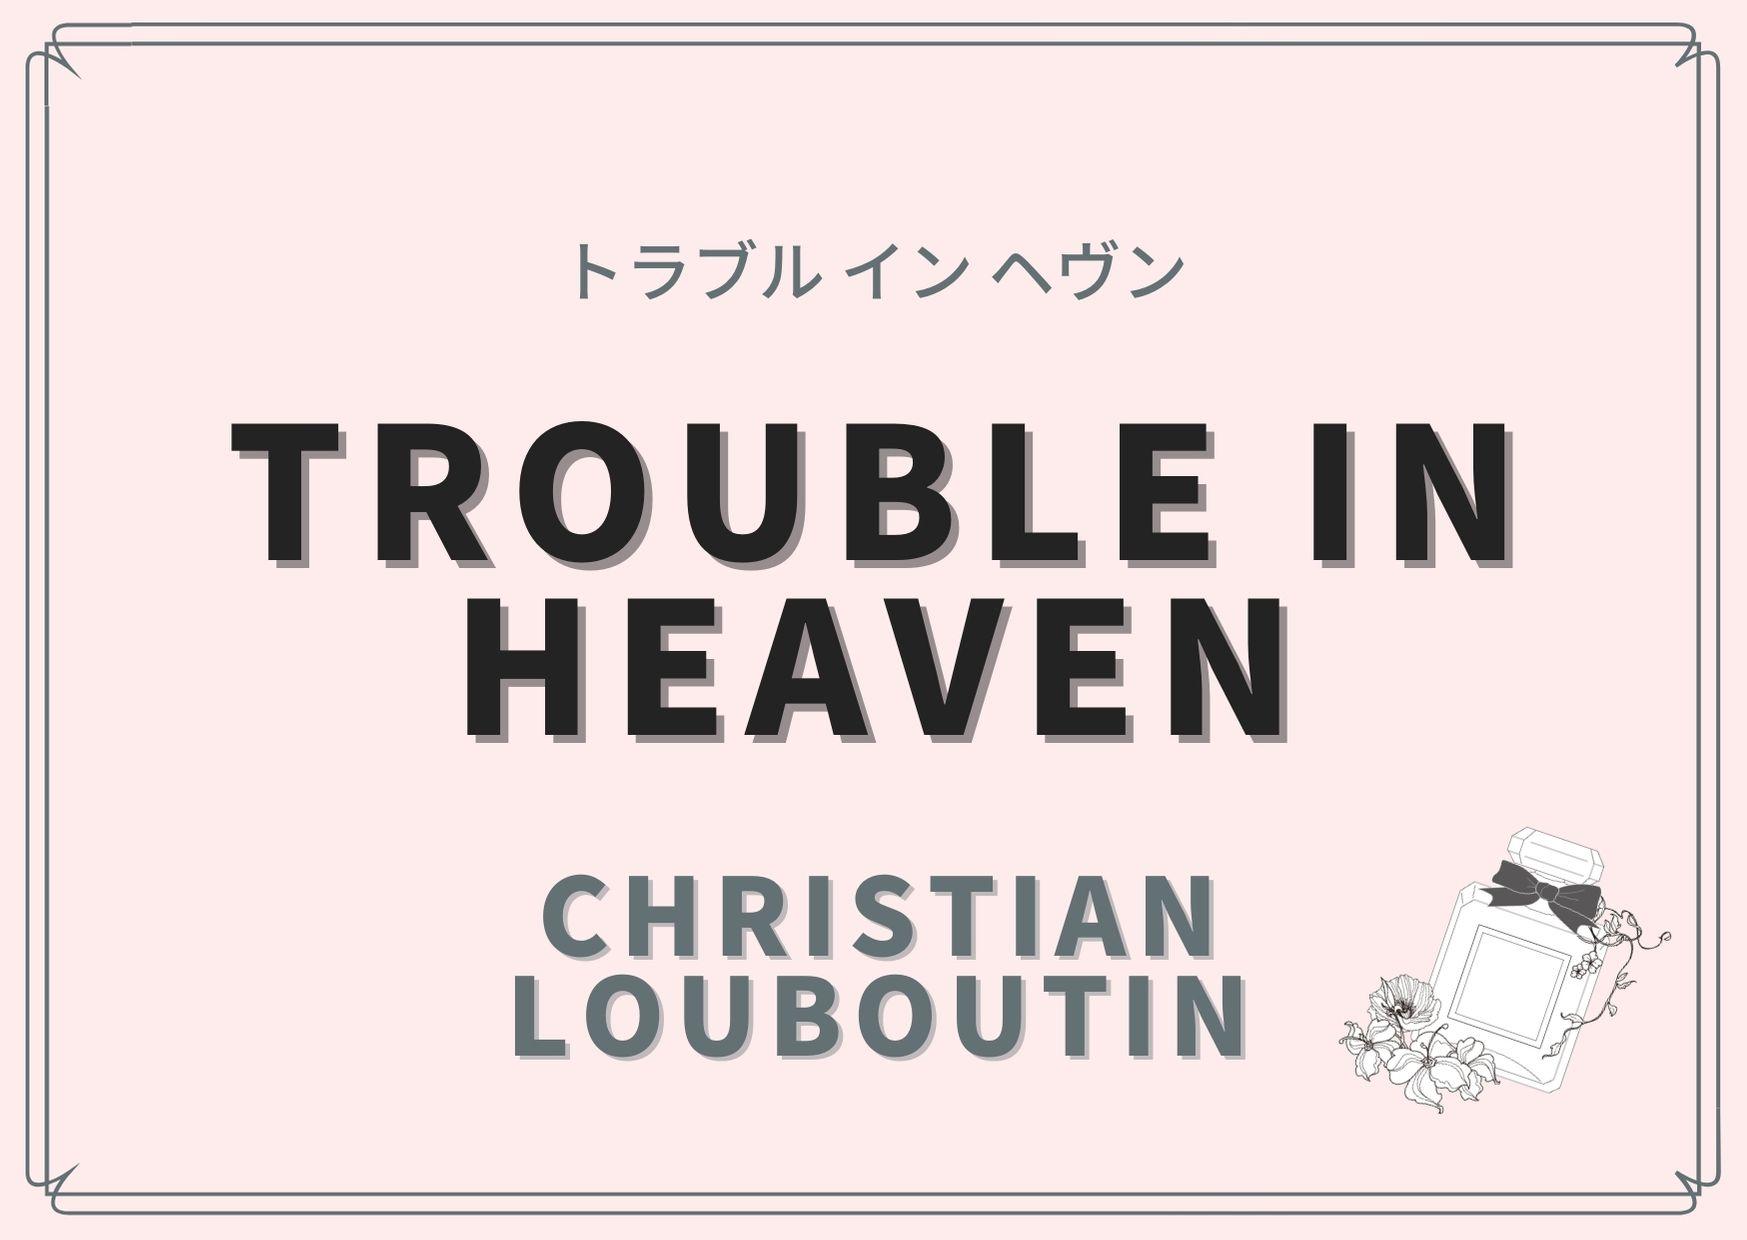 Trouble In Heaven(トラブル イン ヘヴン)/Christian Louboutin(クリスチャン ルブタン)